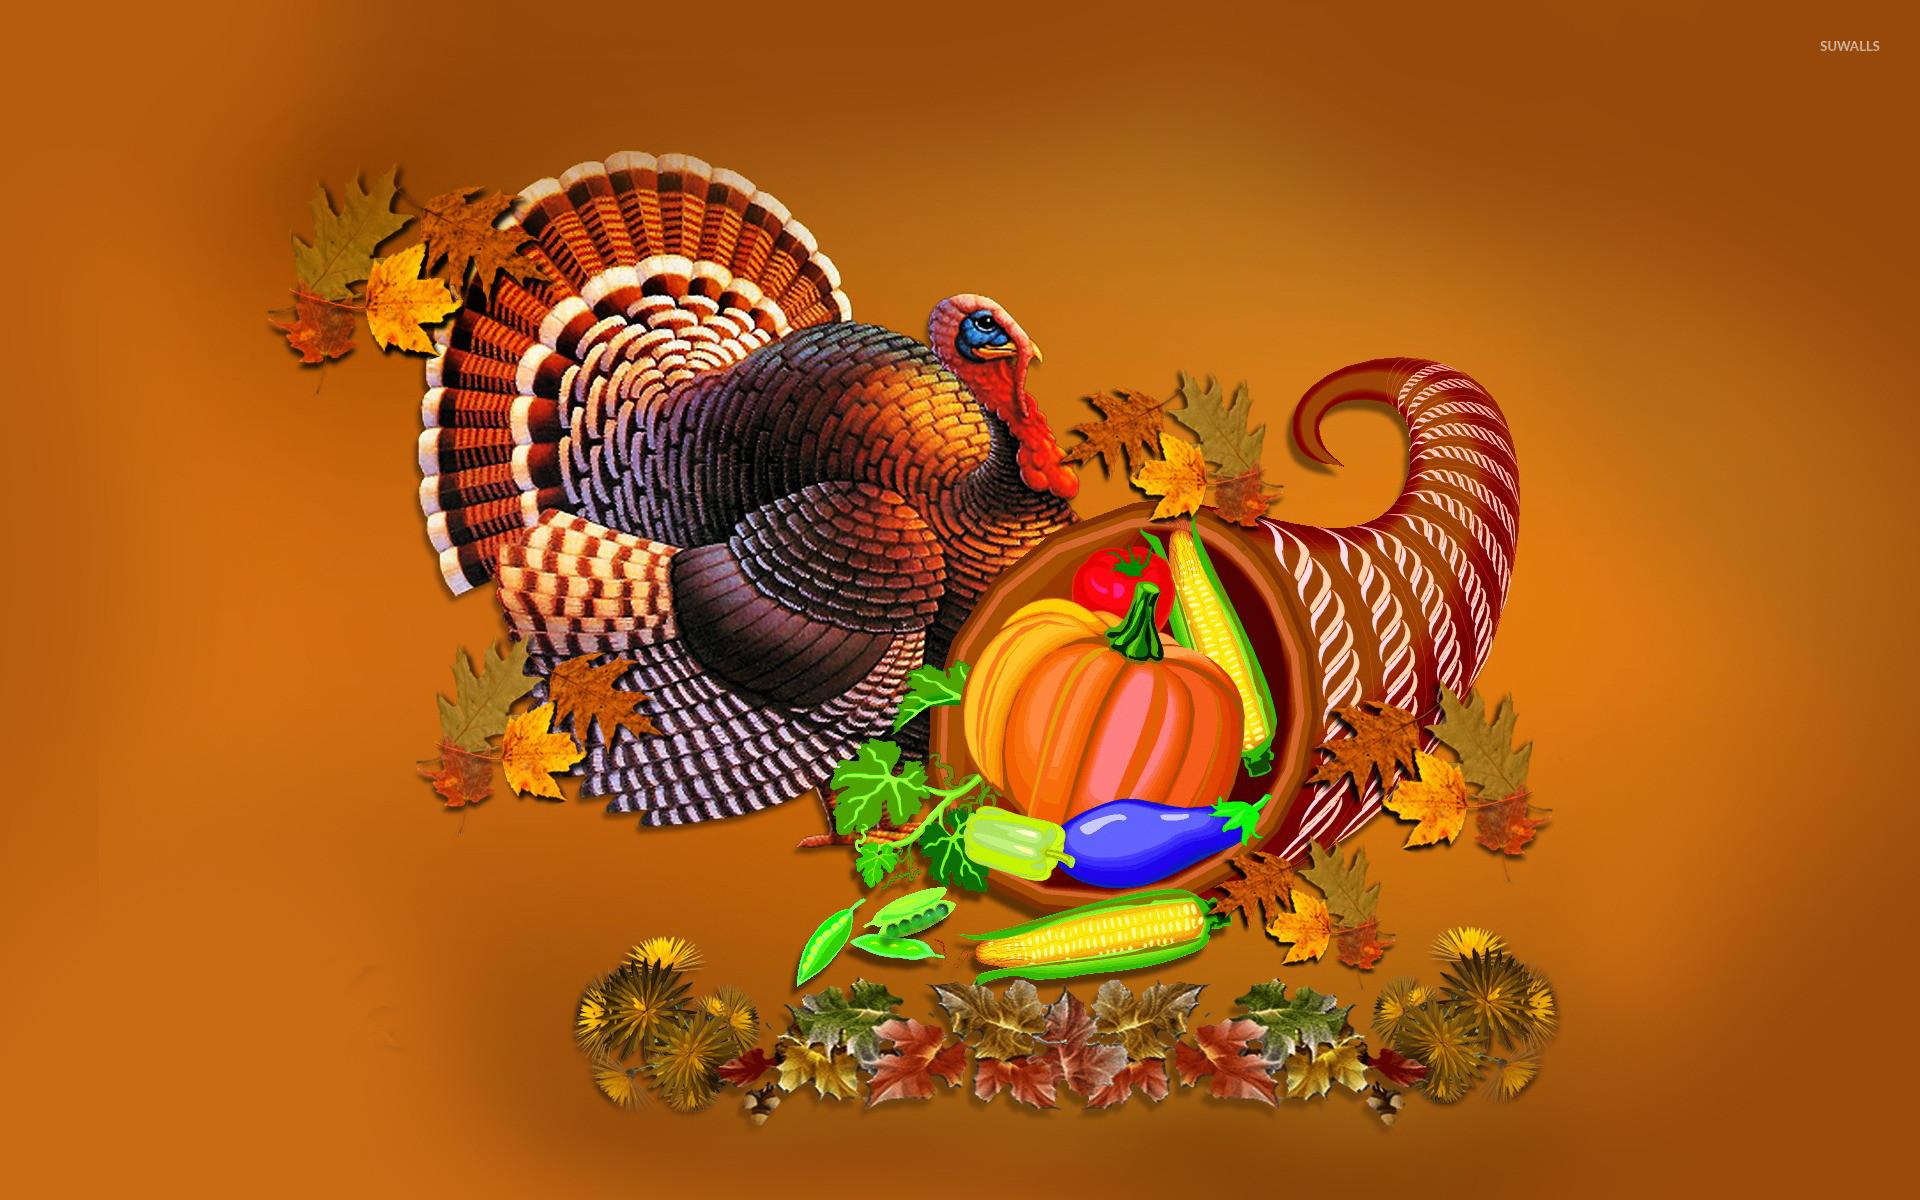 Thanksgiving turkey and cornucopia wallpaper jpg